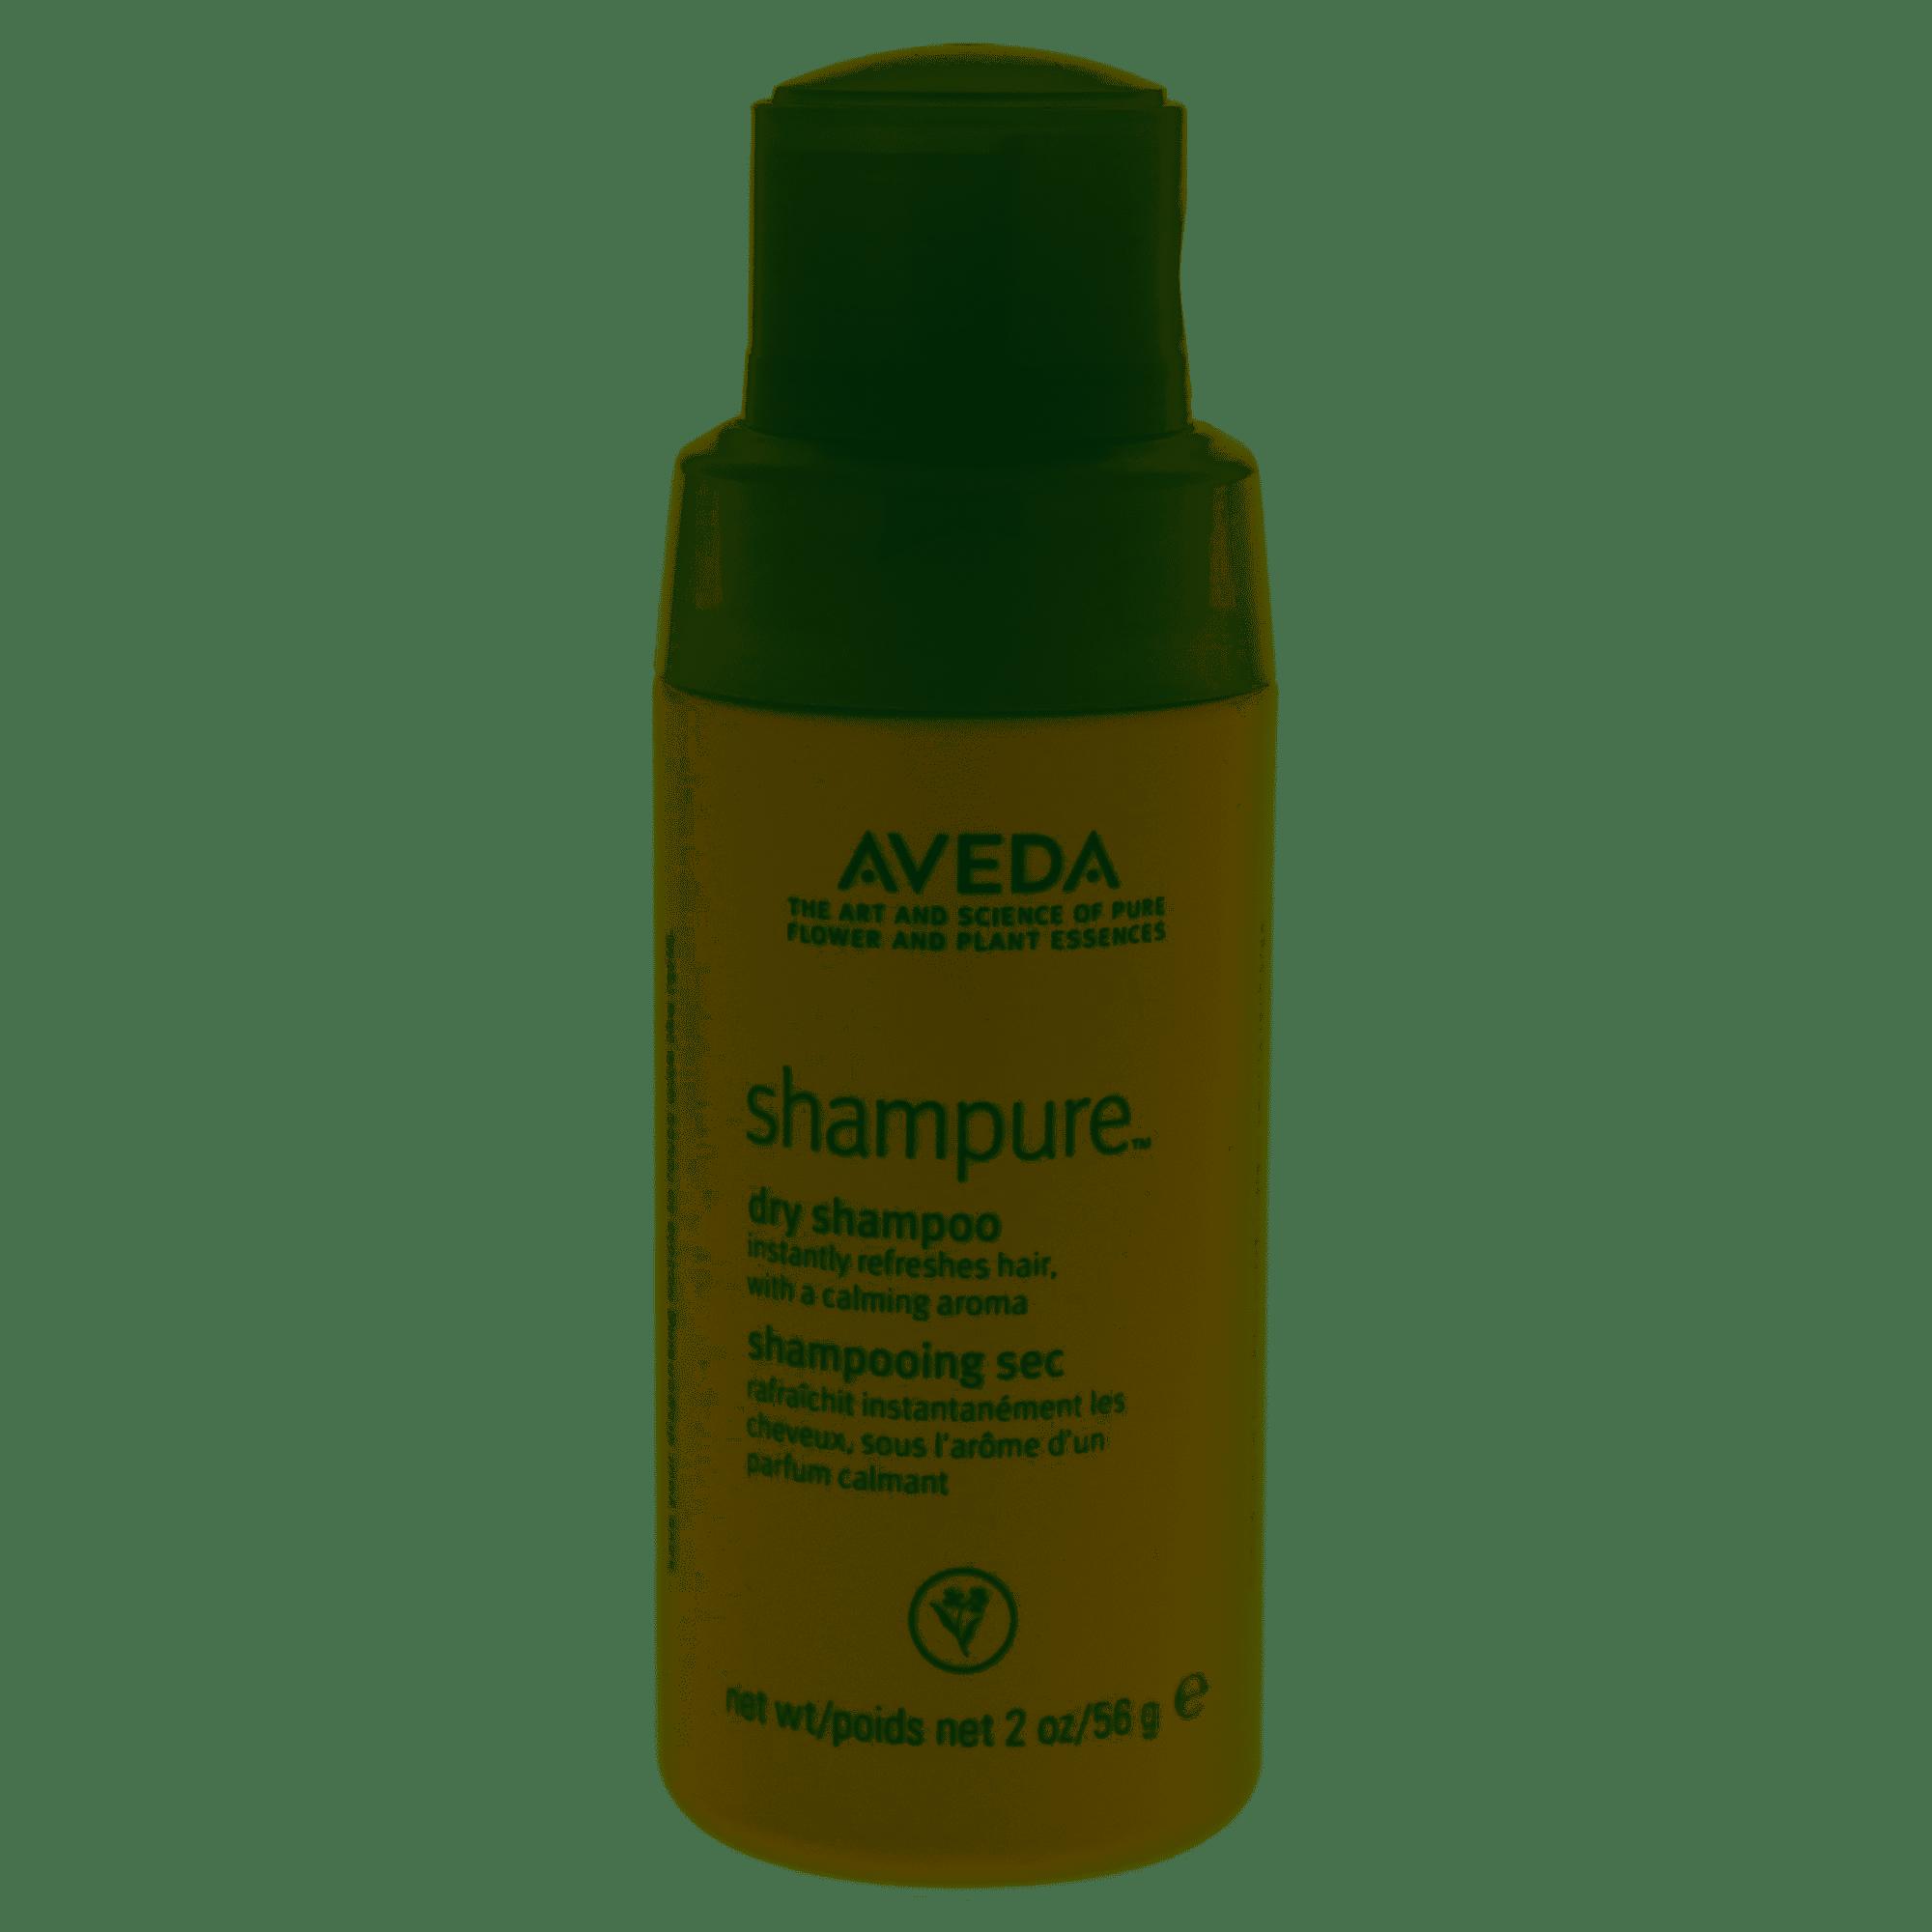 Aveda Dry Shampoo 018084959527